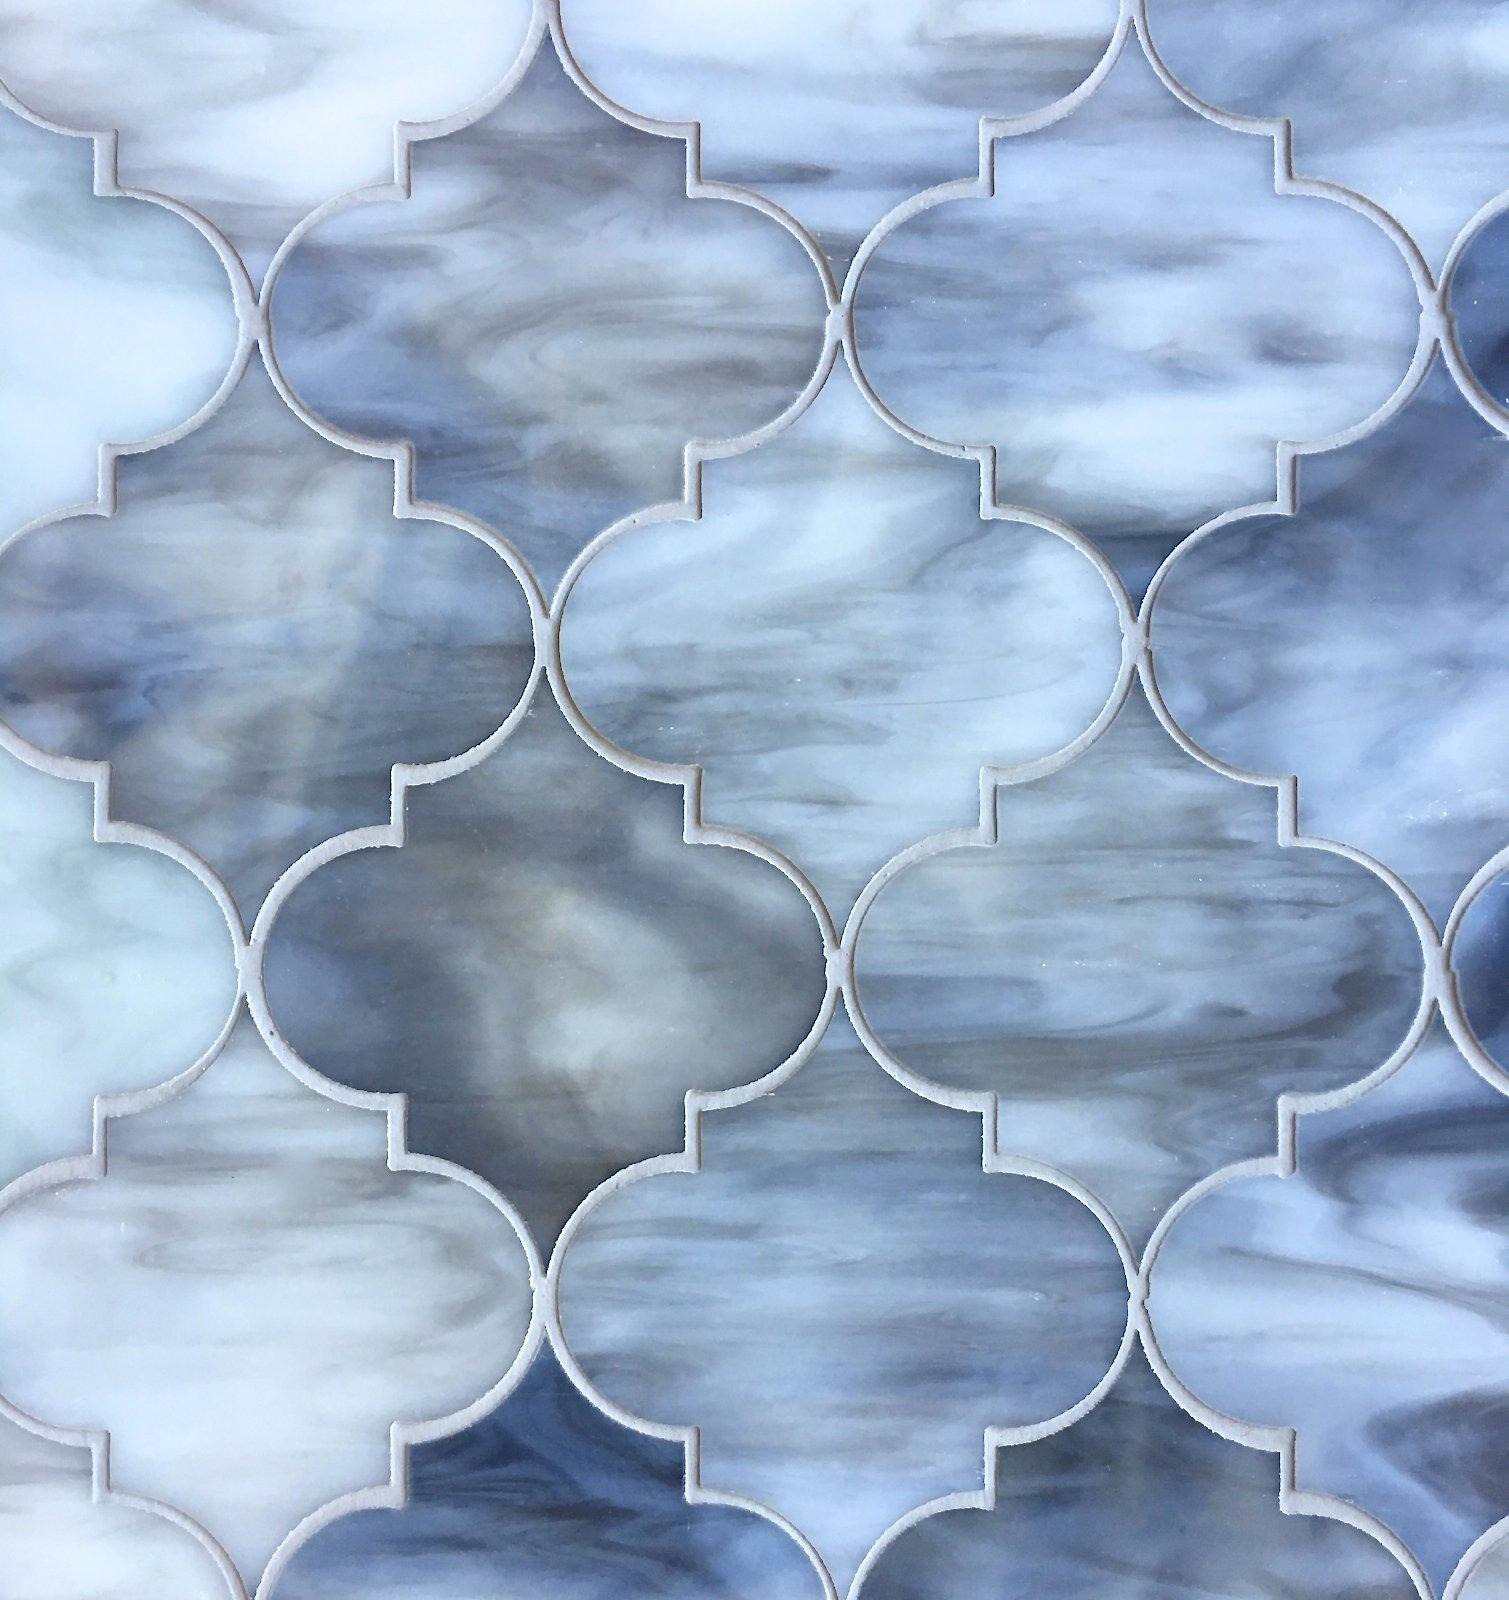 Arabesque Lantern 11.5x13 Grey Glass Mosaic Tiles Wall Backsplash